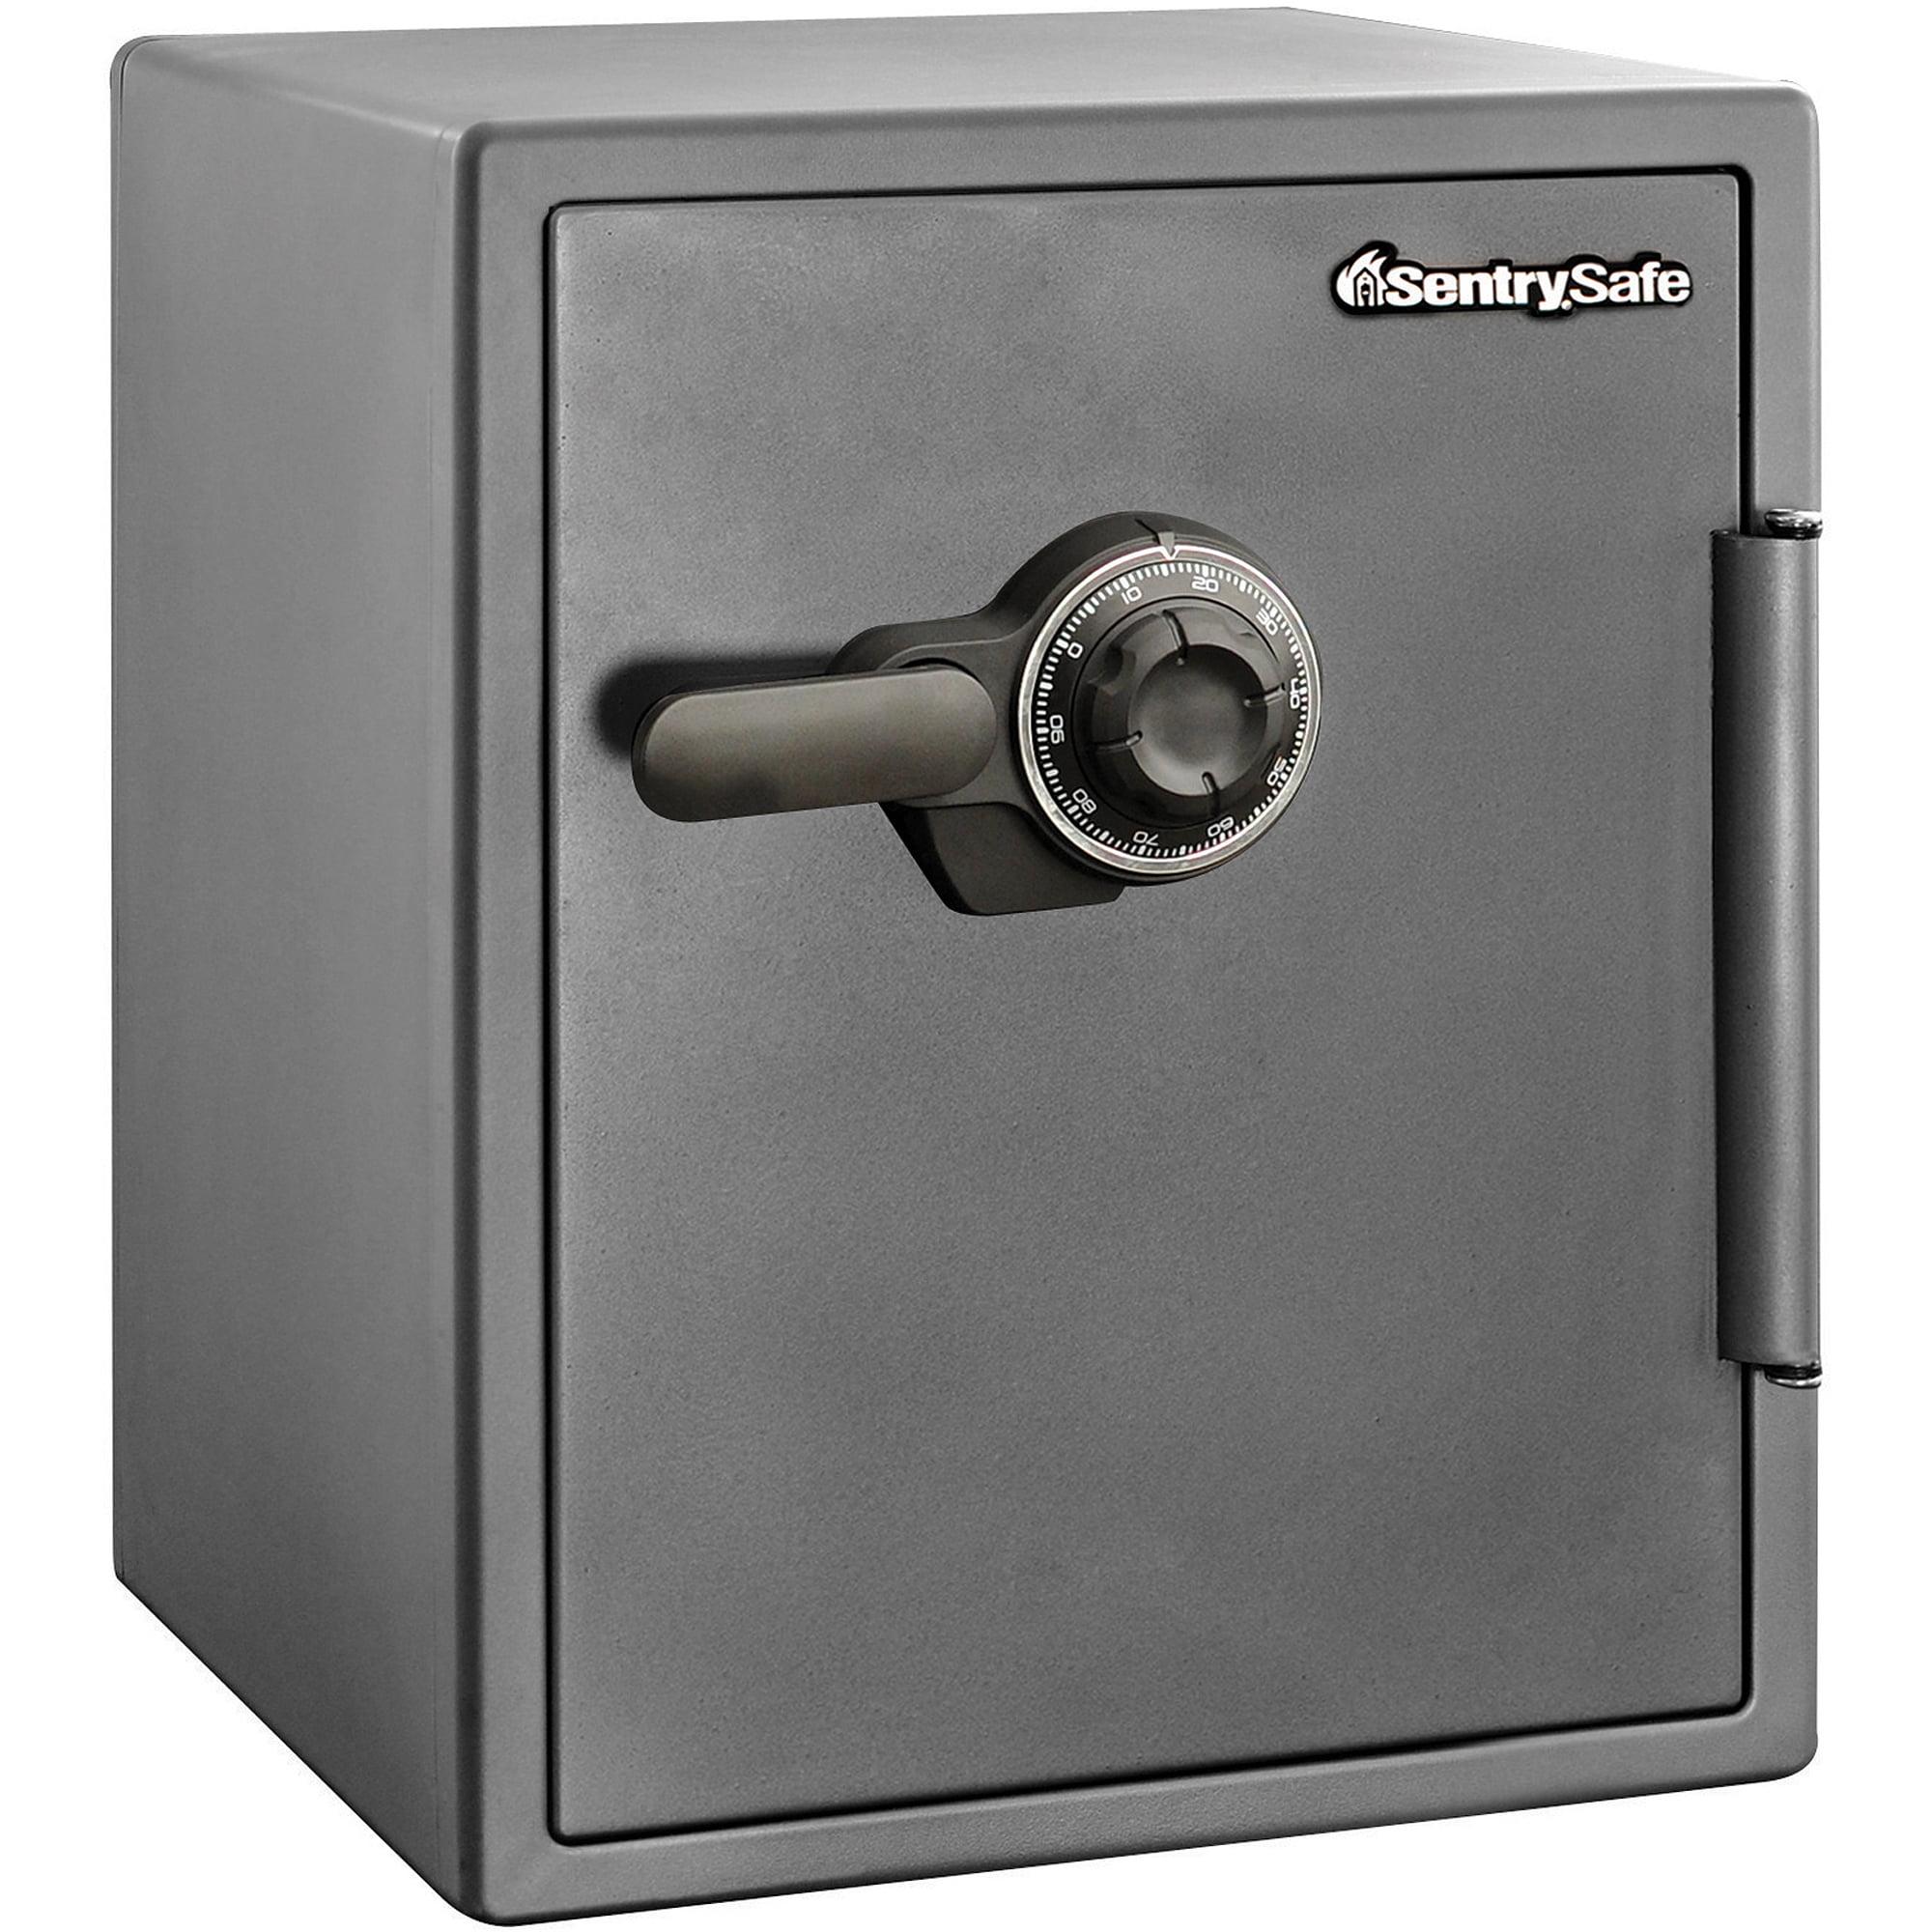 SentrySafe 2.0 cu ft XX-Large Combination Safe